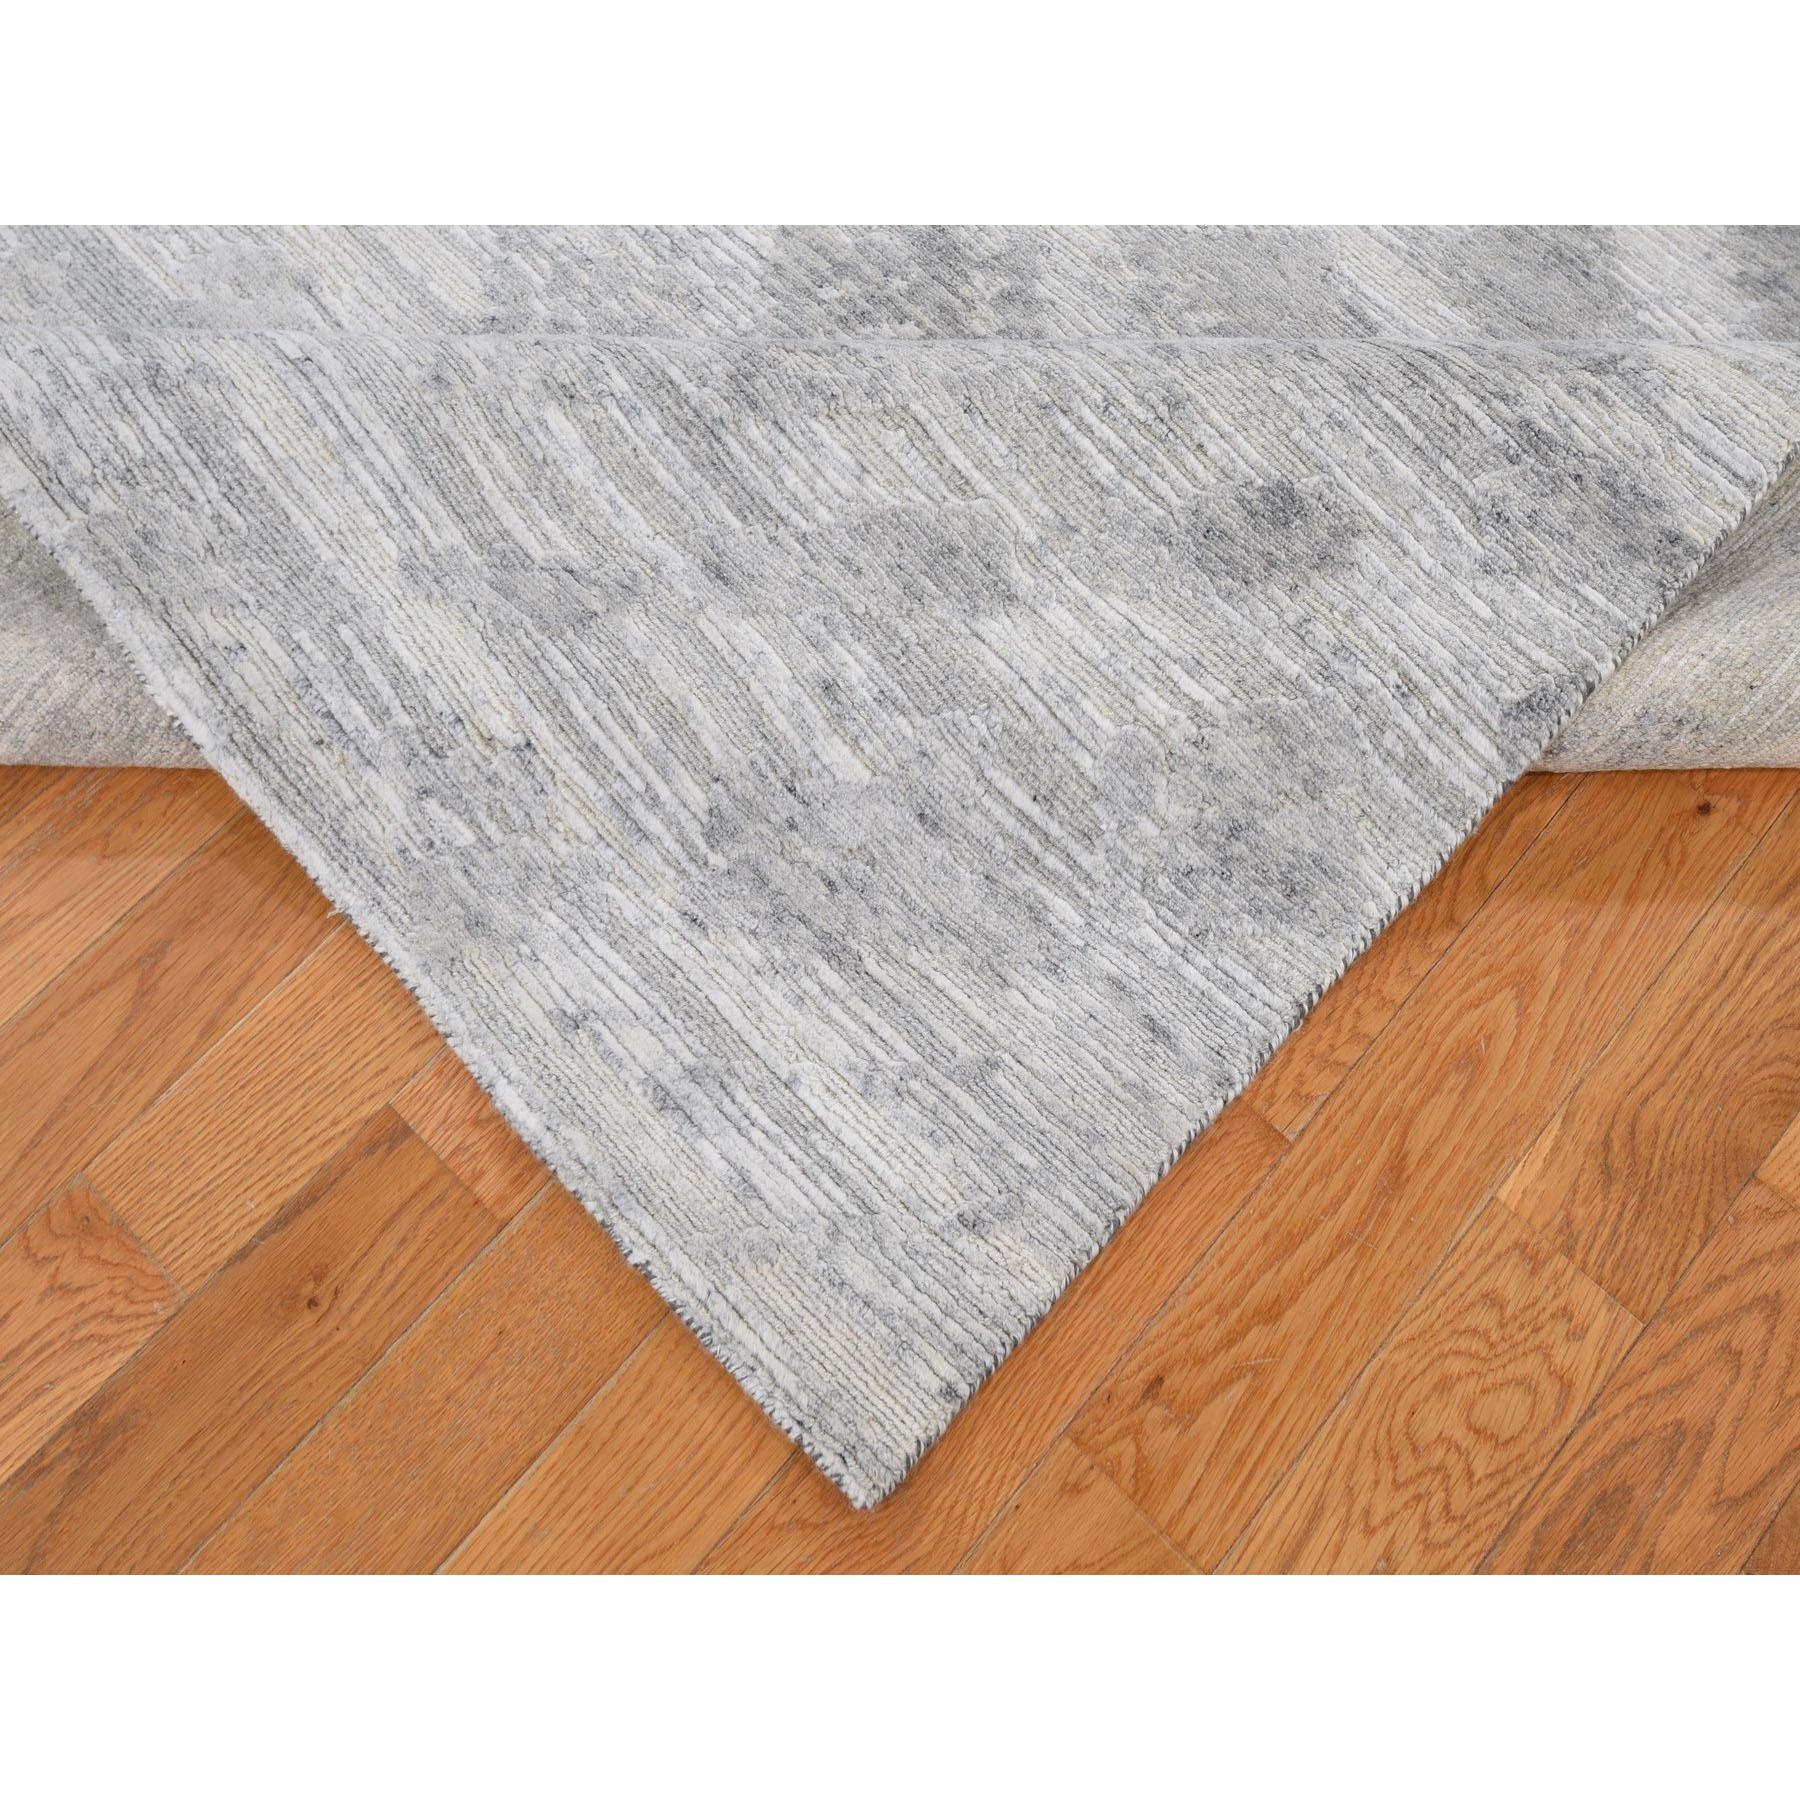 6'x9' Silver Hand Spun Undyed Natural Wool Modern Hand Knotted Oriental Rug